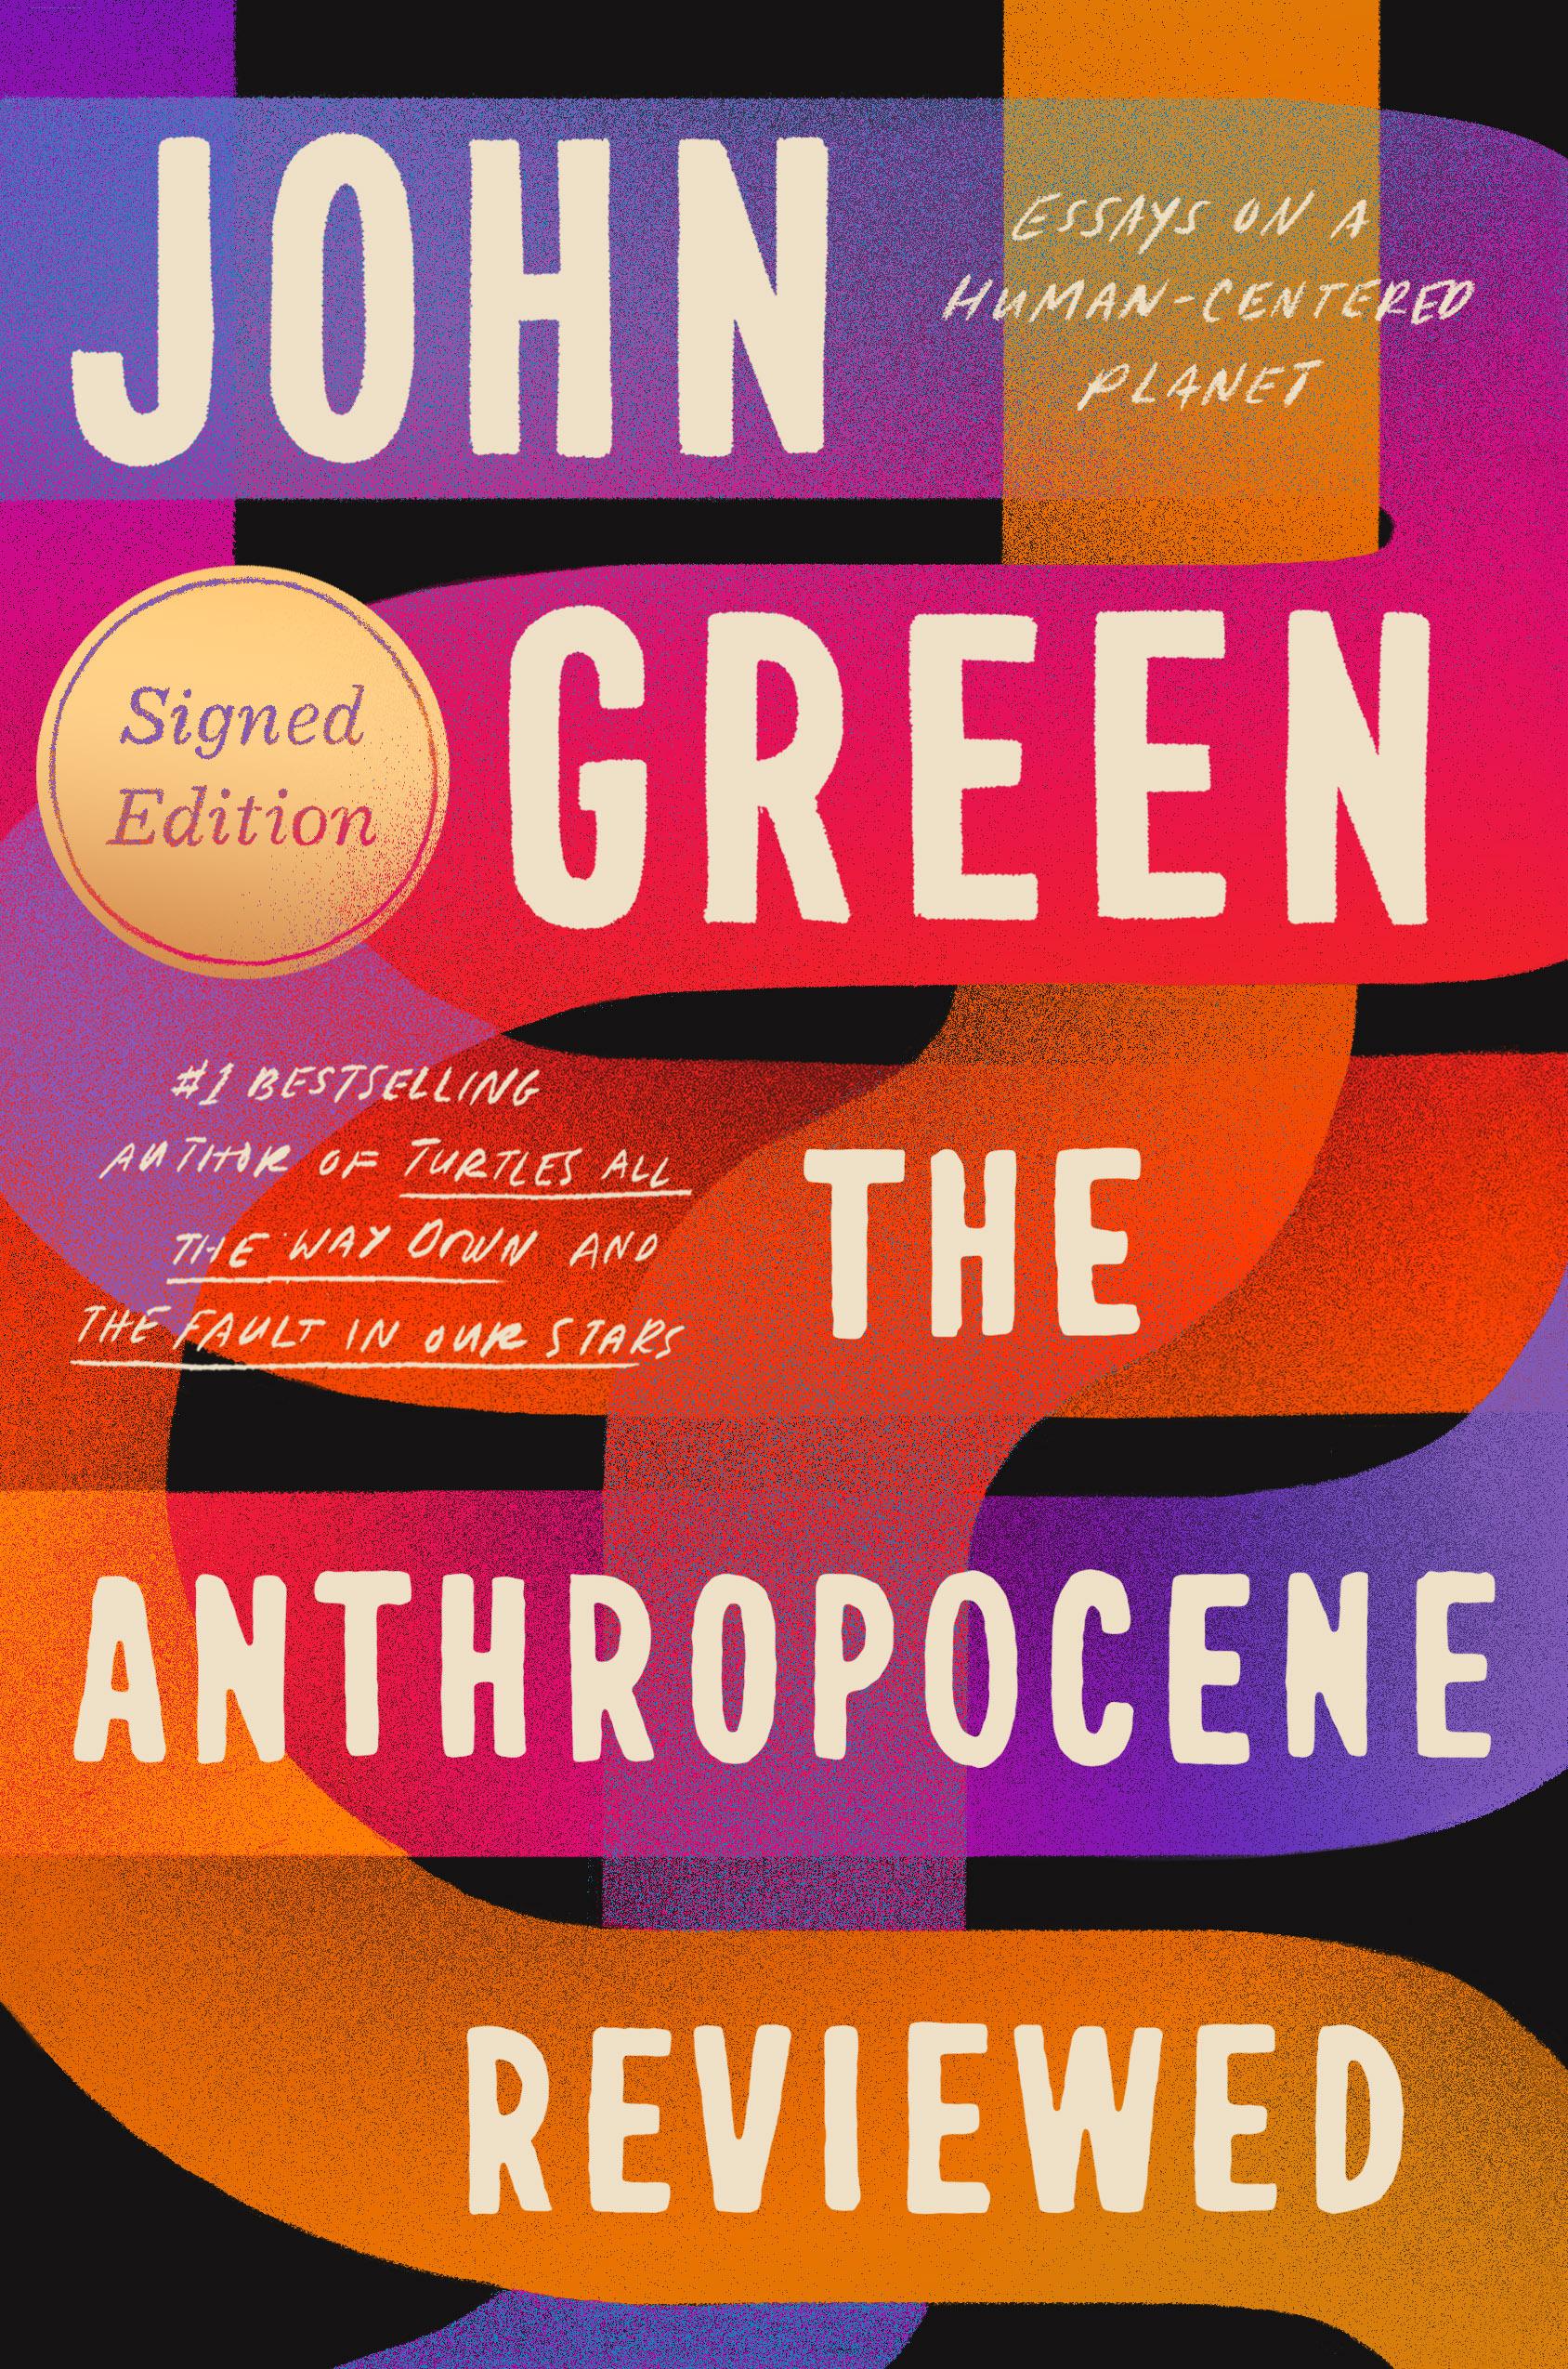 John Green's last non-fictional work,